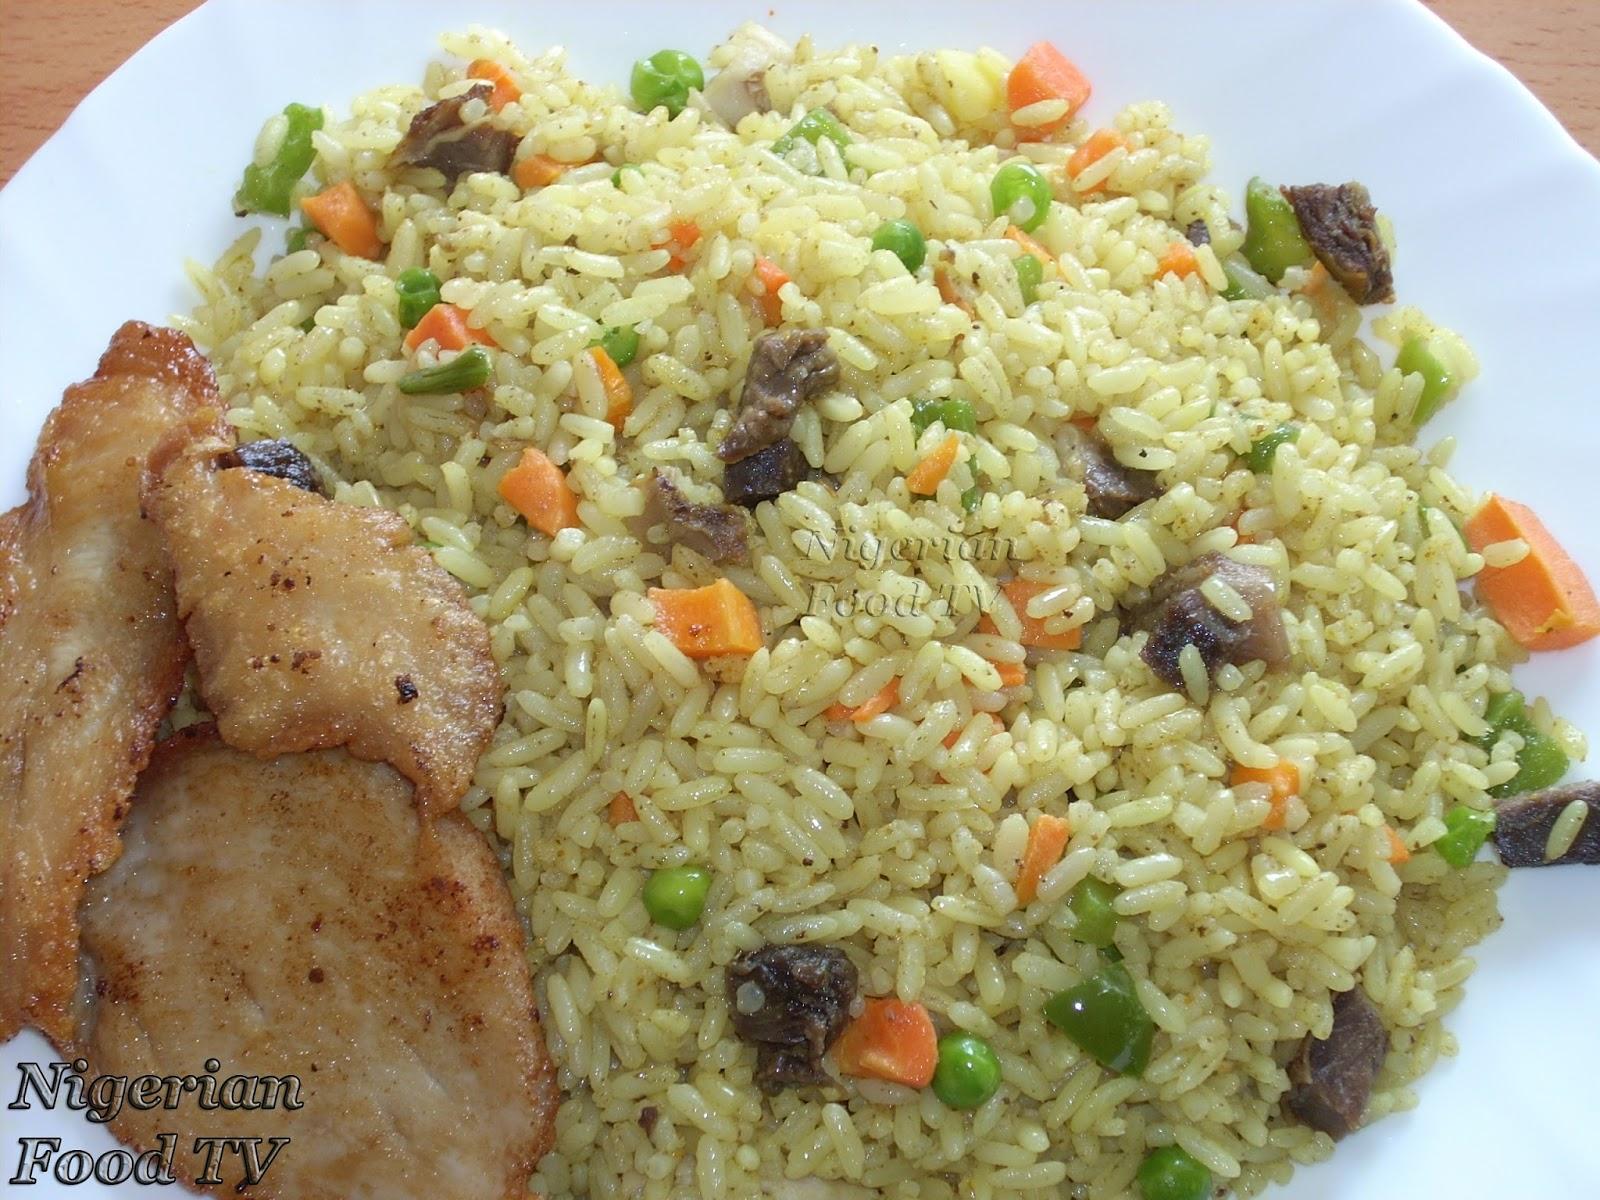 ,Nigerian Christmas Food, Nigerian XMAS recipes, Nigerian Christmas recipes, Specials (Delicious Xmas Meals)Nigerian Food Recipes, Nigerian Food Recipes, Nigerian Recipes, Nigerian Food